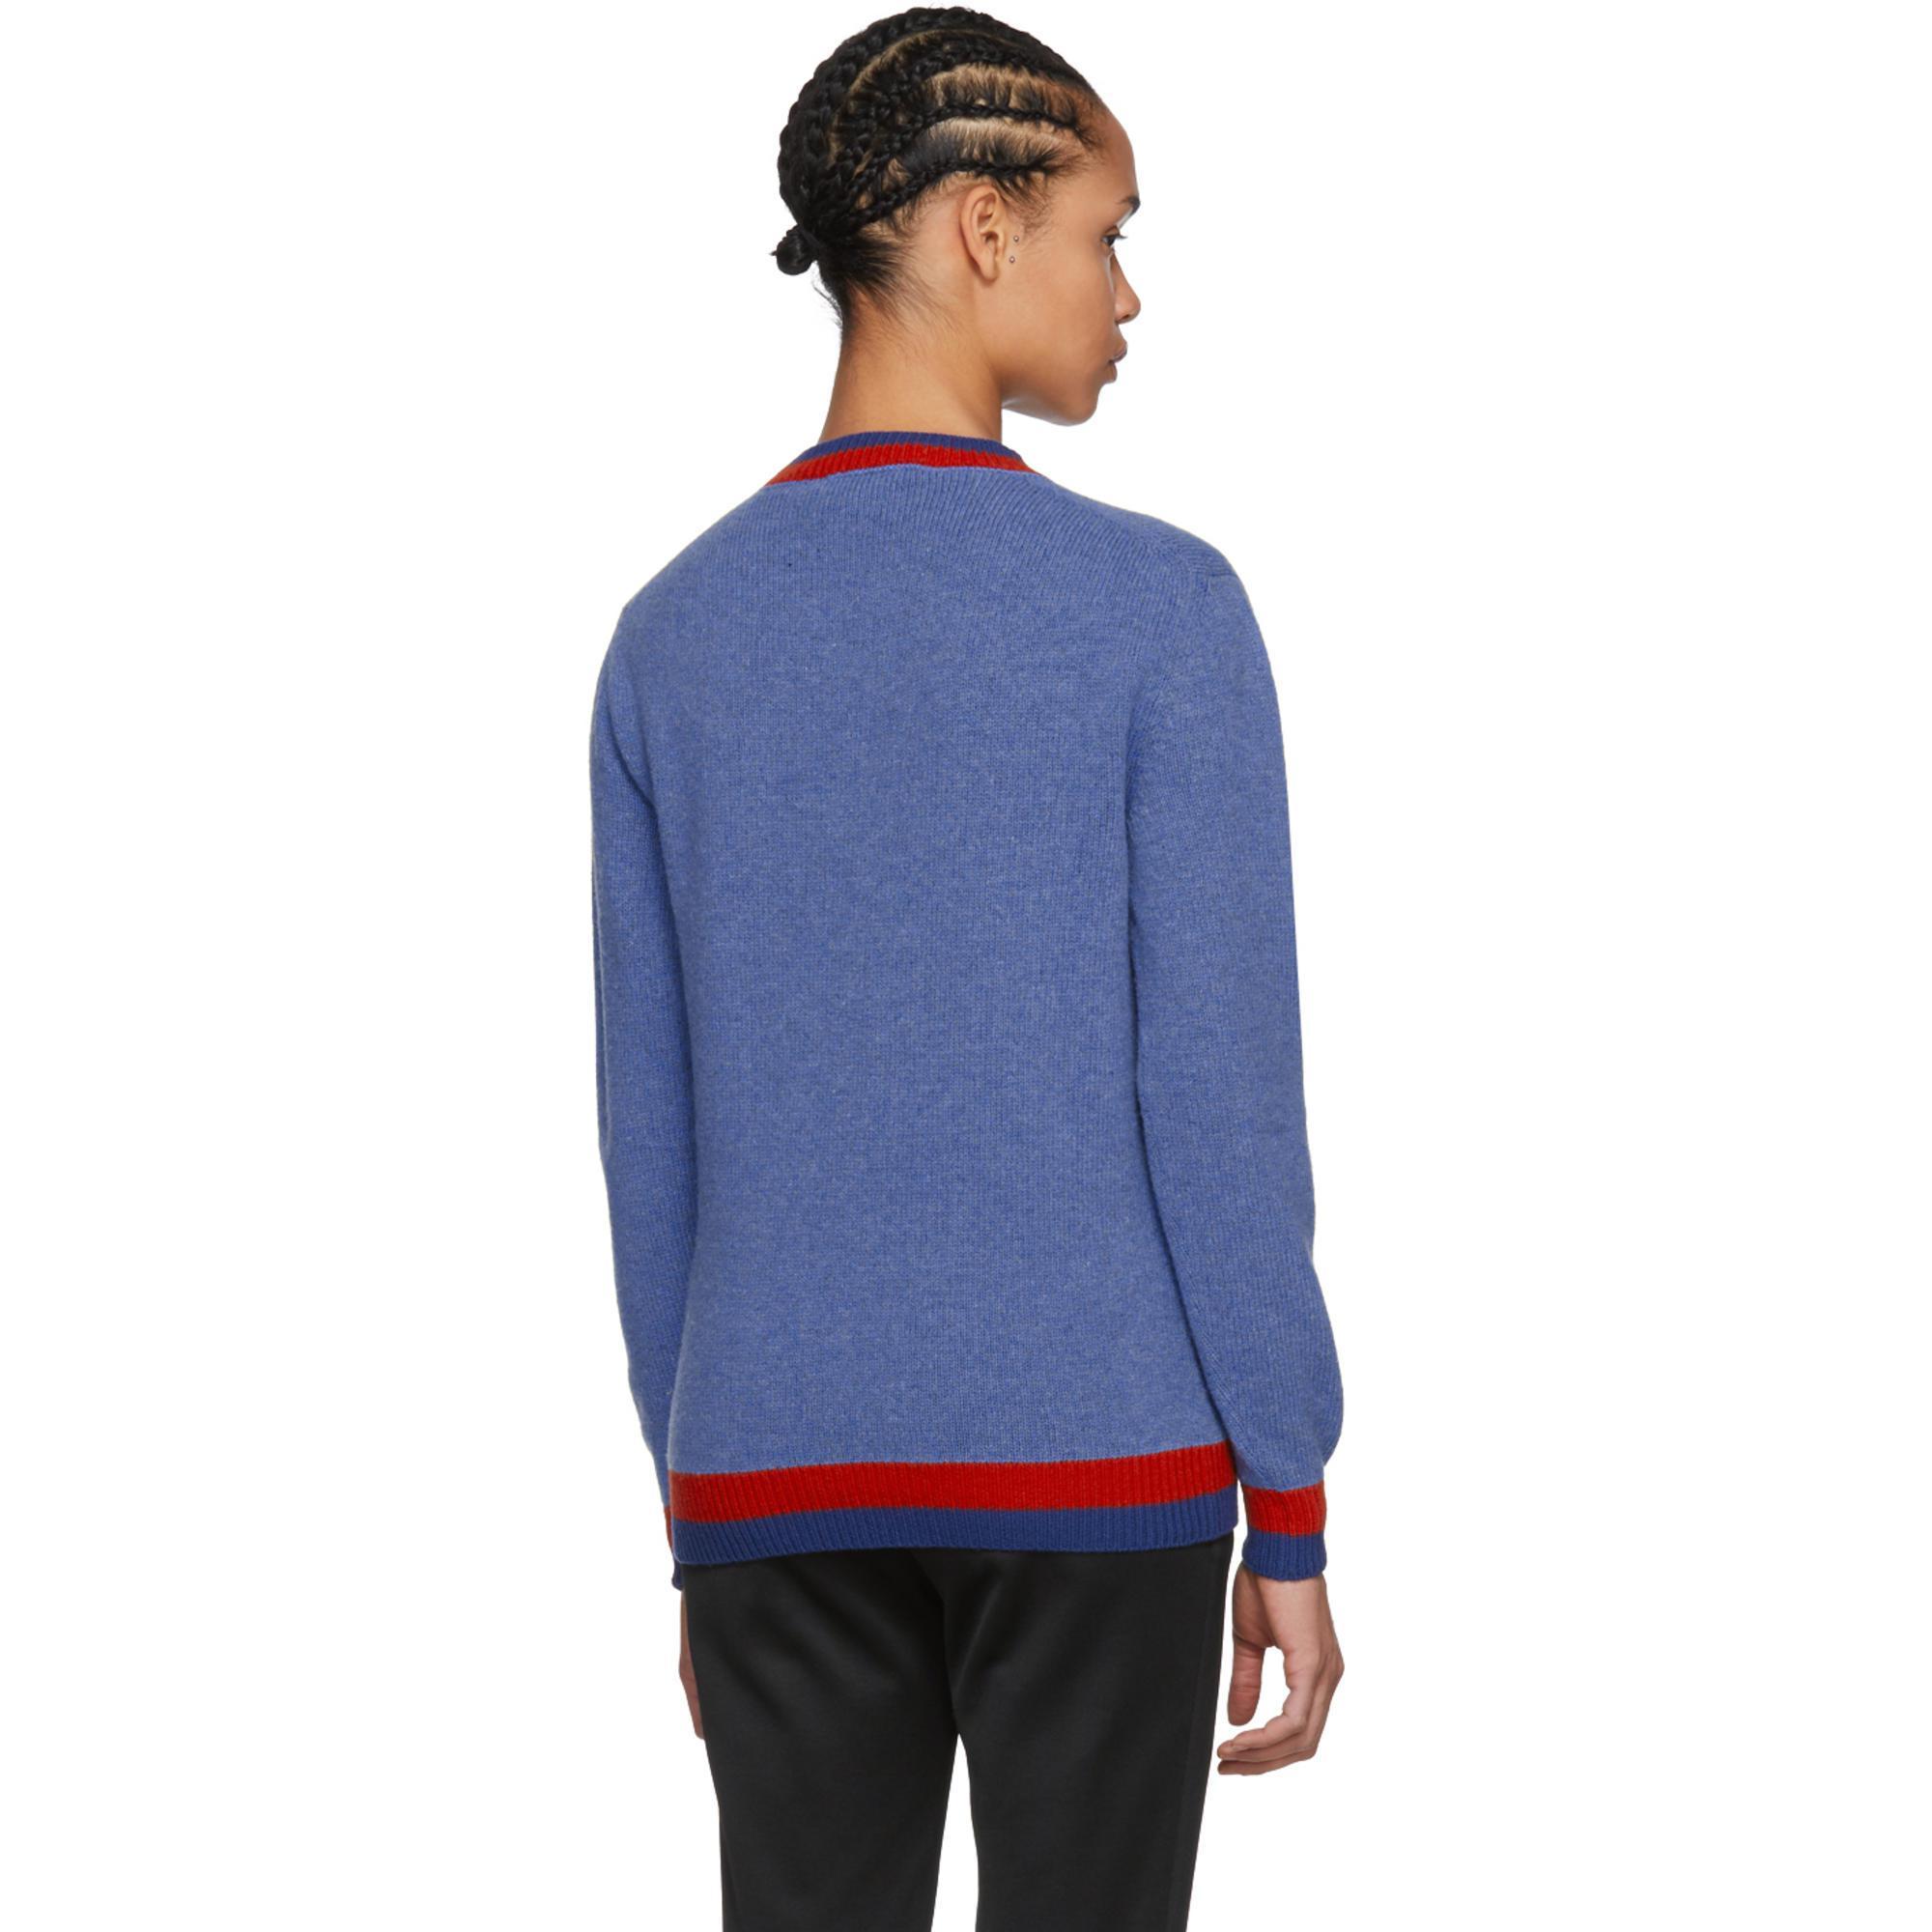 46e79e84c Gucci Blue Rabbit Knit Sweater in Blue - Lyst